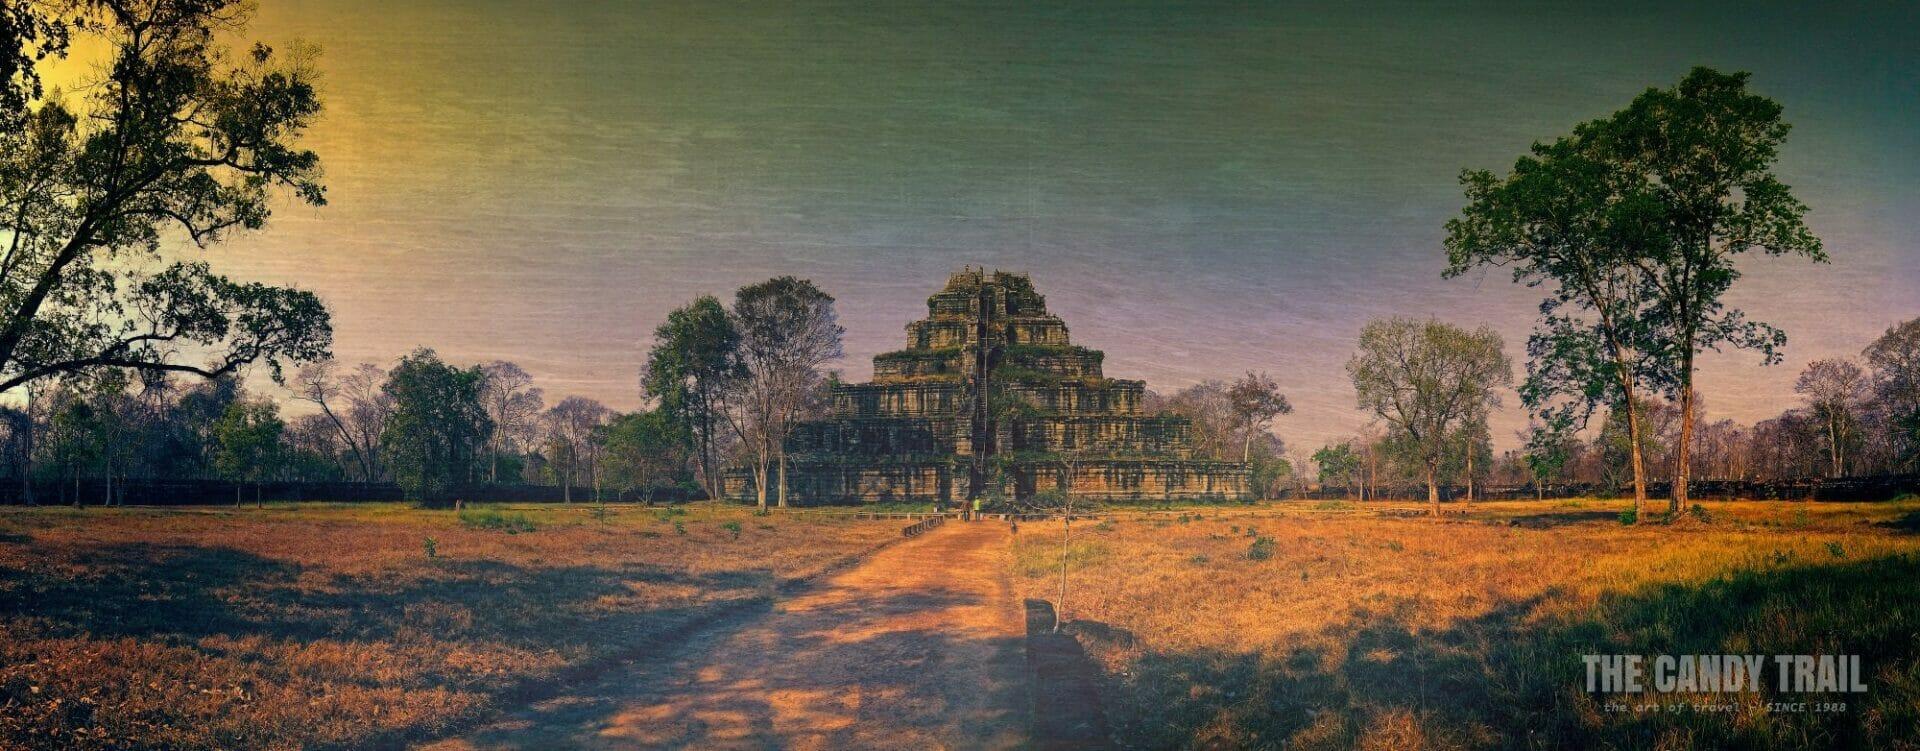 Panorama Morning Pyramid Prasat Thom Koh Ker Temples Cambodia